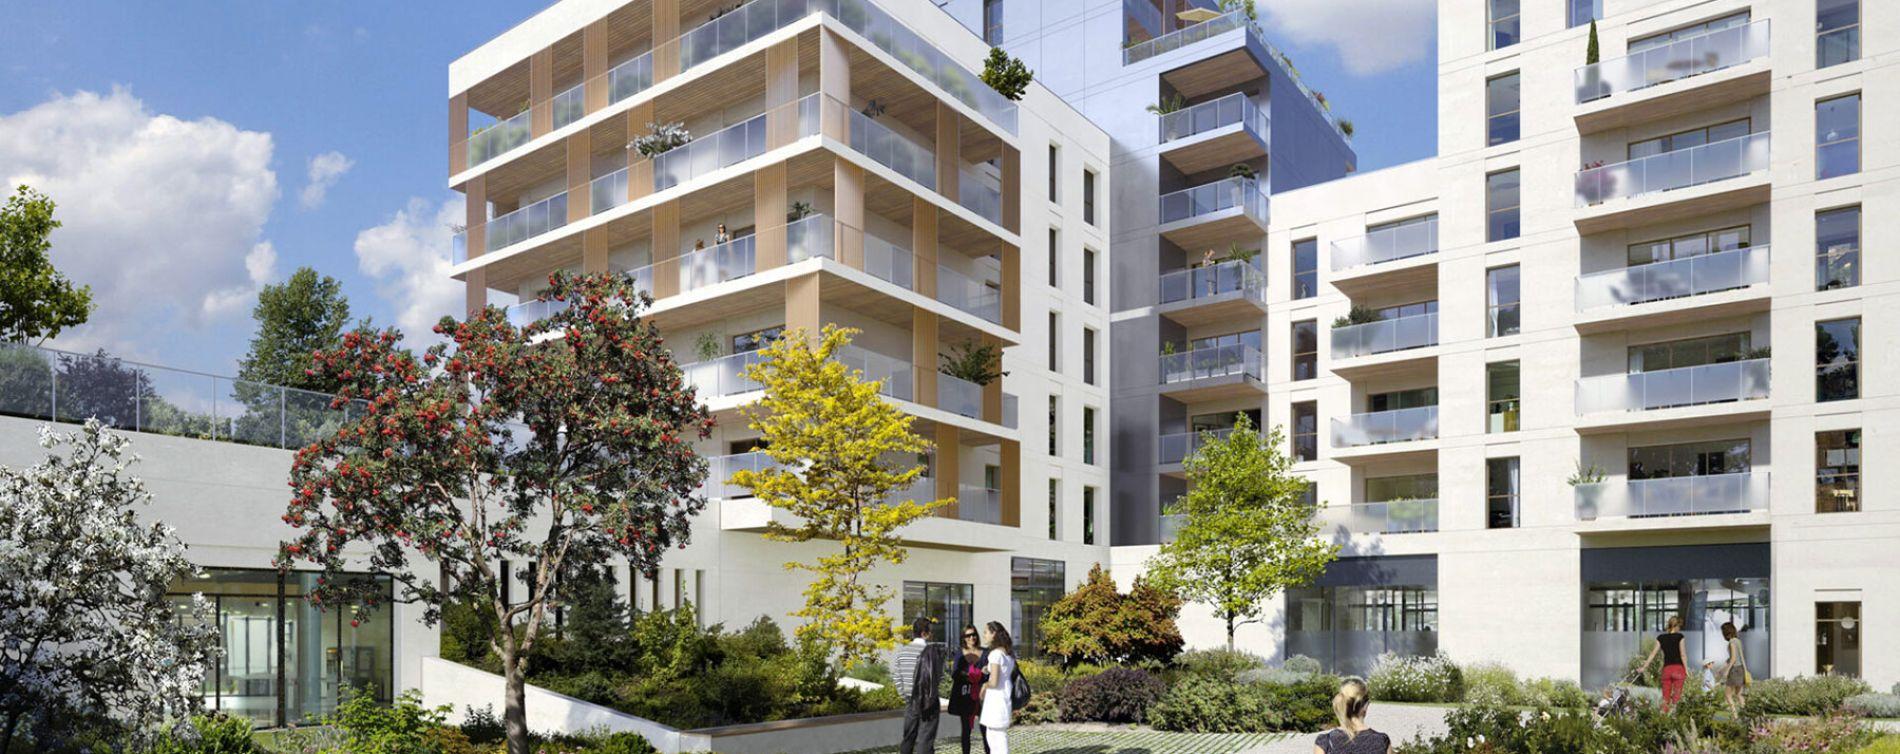 Rueil-Malmaison : programme immobilier neuve « Programme immobilier n°218735 » (2)